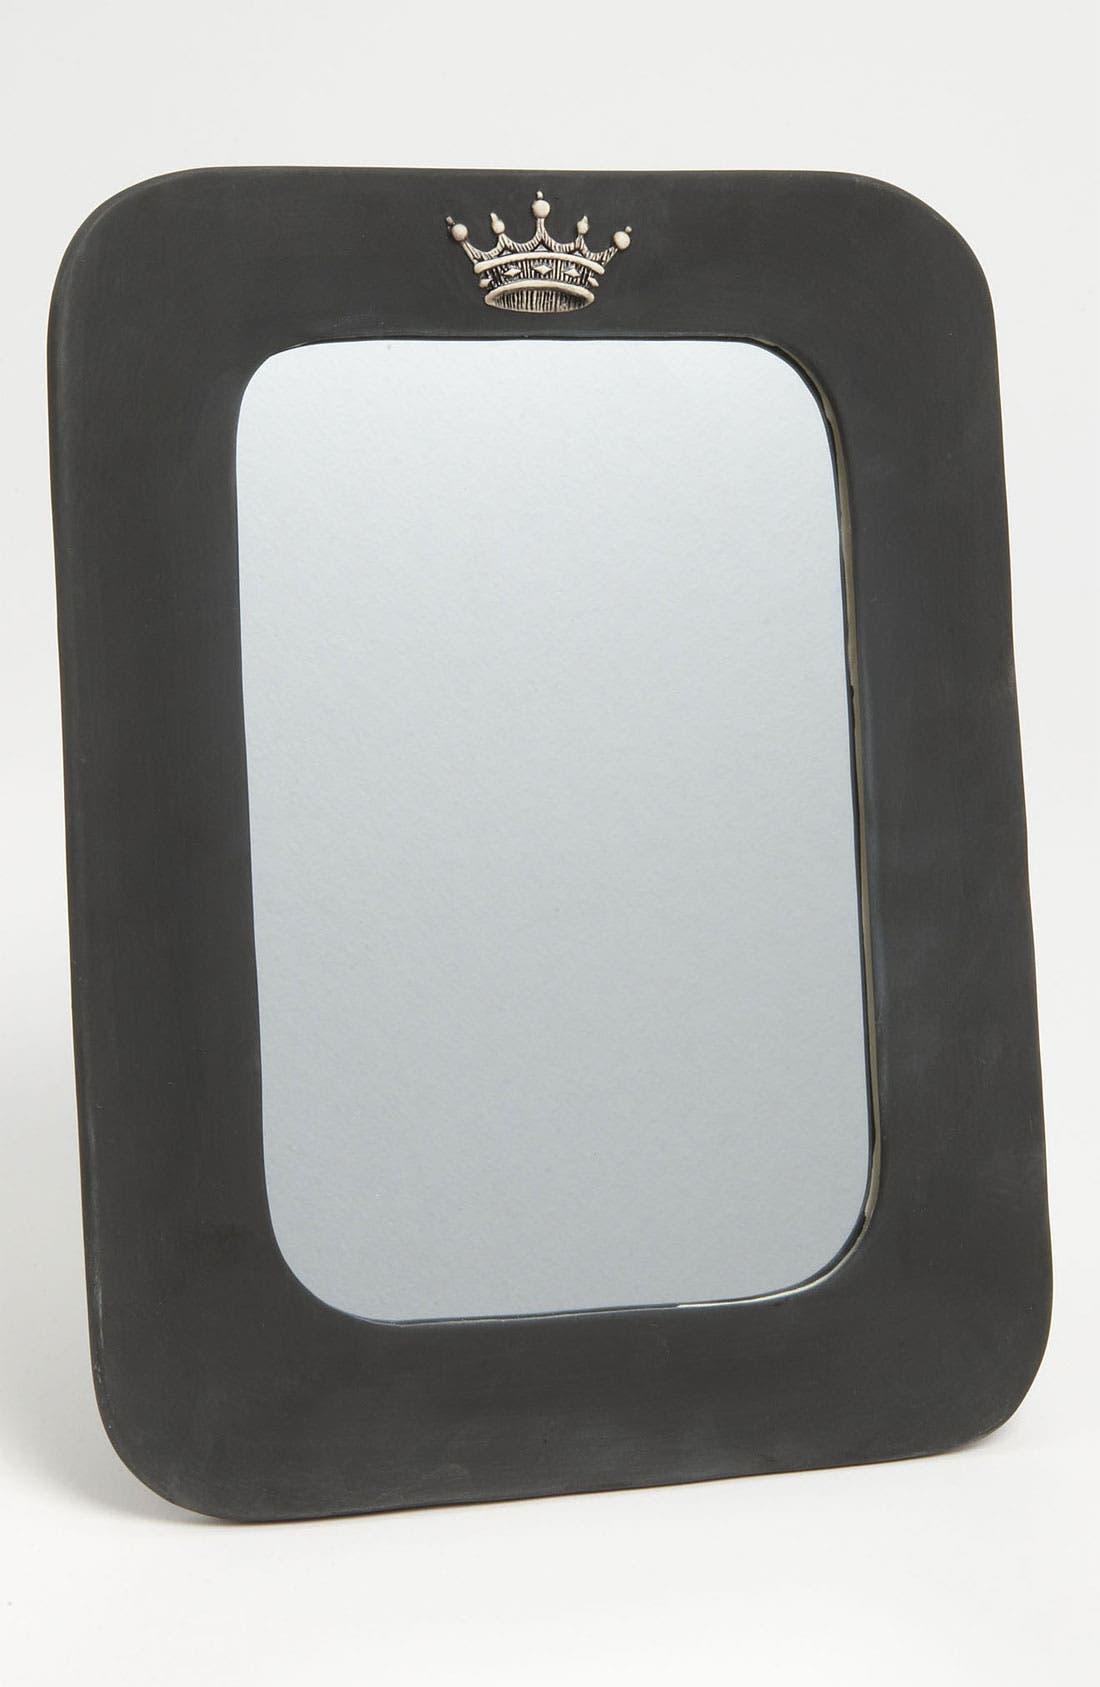 Alternate Image 1 Selected - Rae Dunn by Magenta Chalkboard Frame Mirror